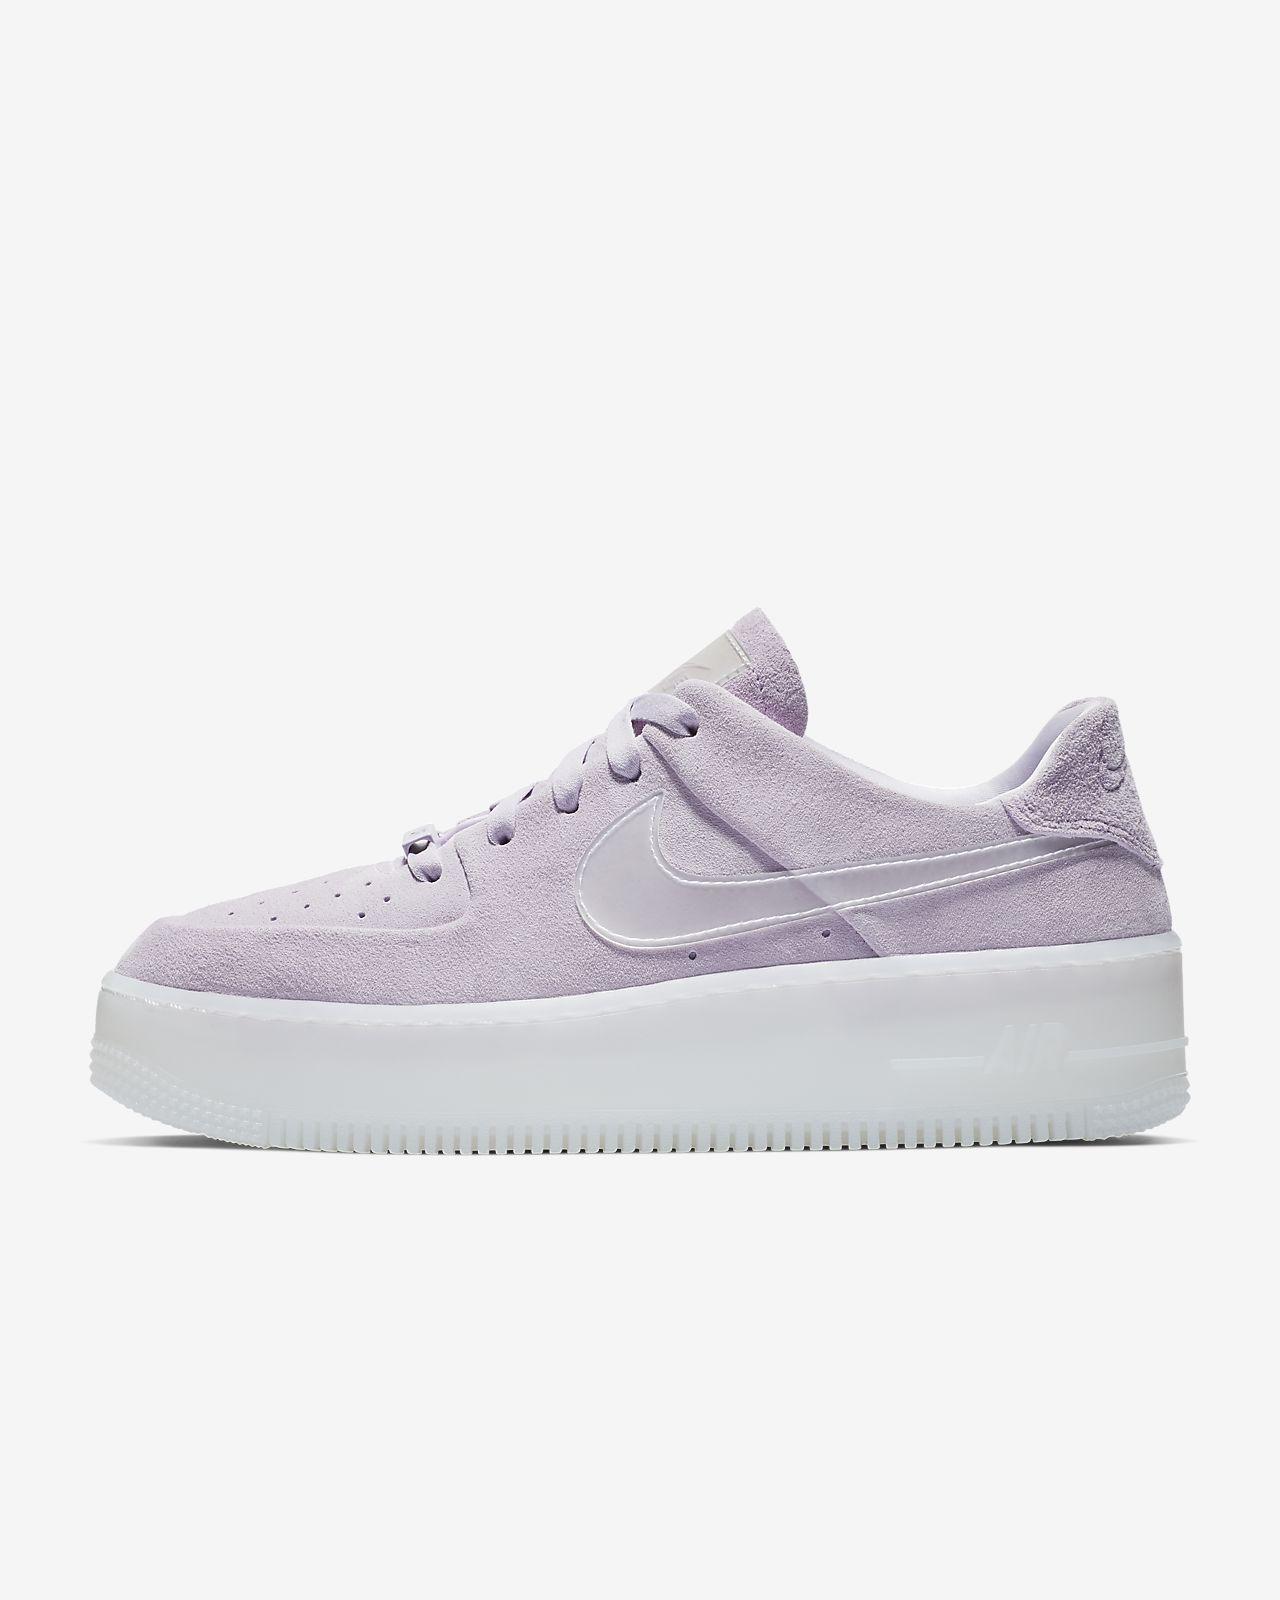 d4662db0df1 ... italy coupon code for nike air force 1 sage low lx sko til kvinder  2033b ca2f7